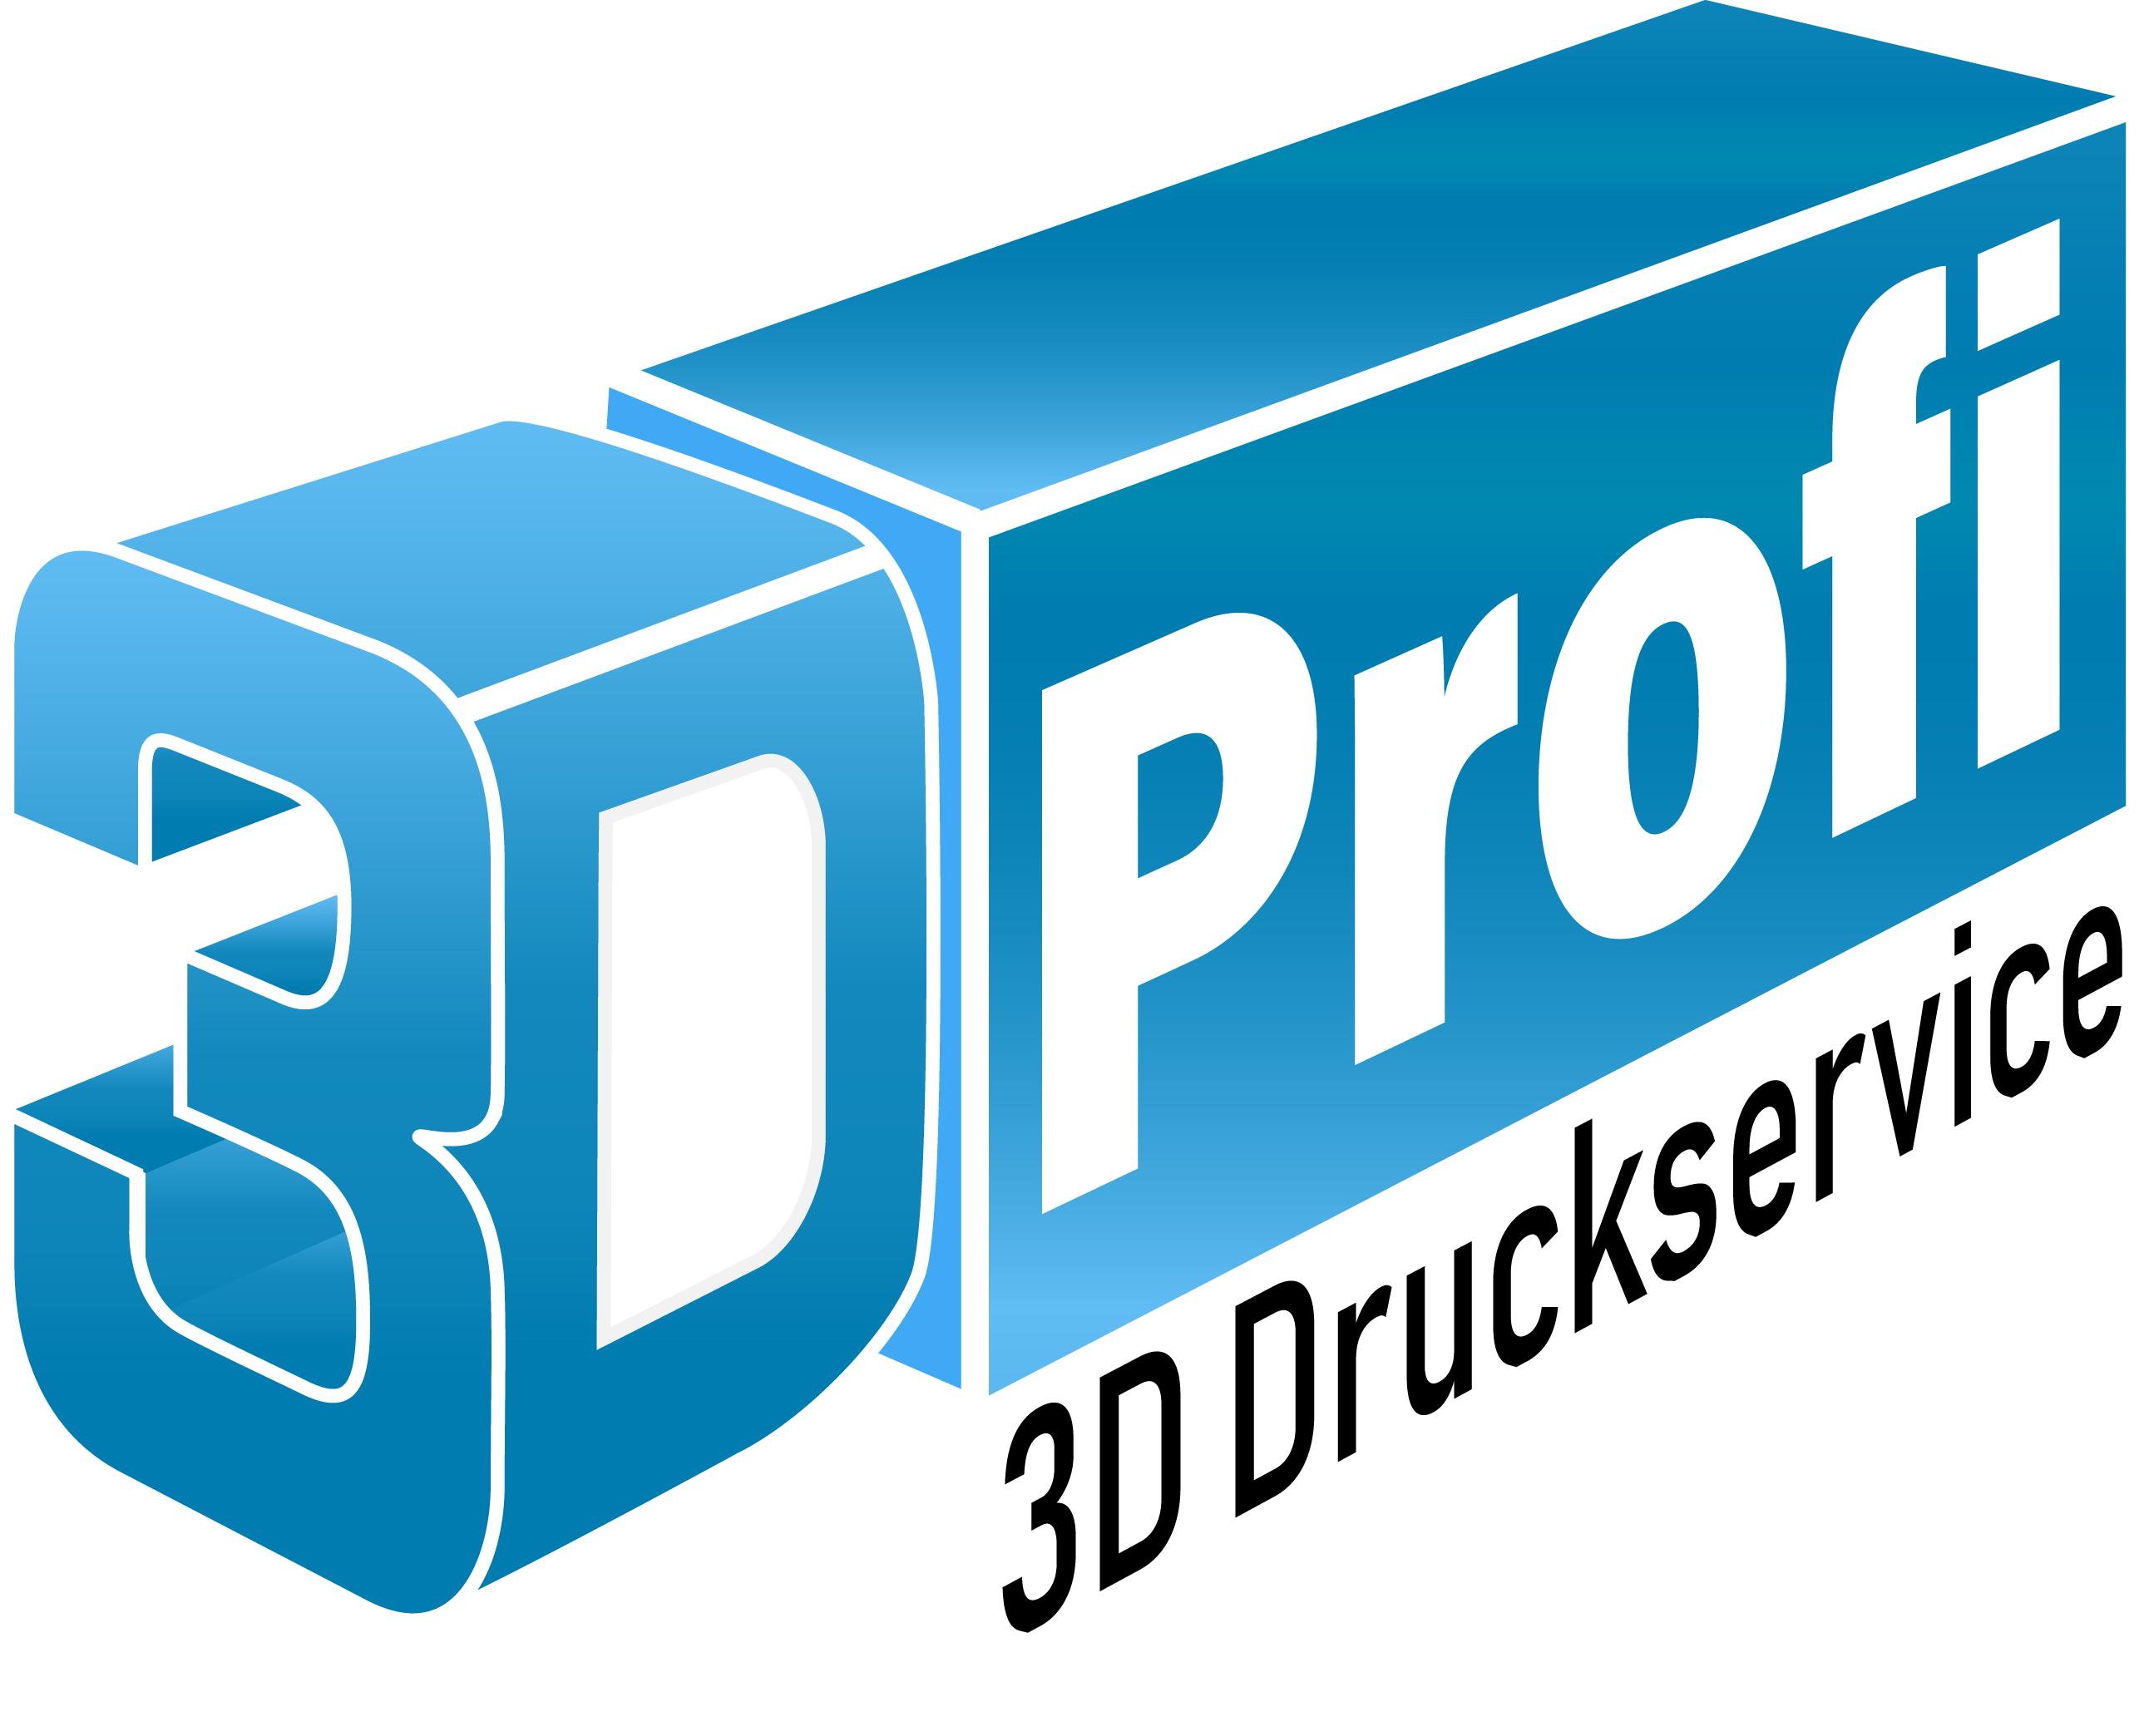 3D Druck Onlineshop